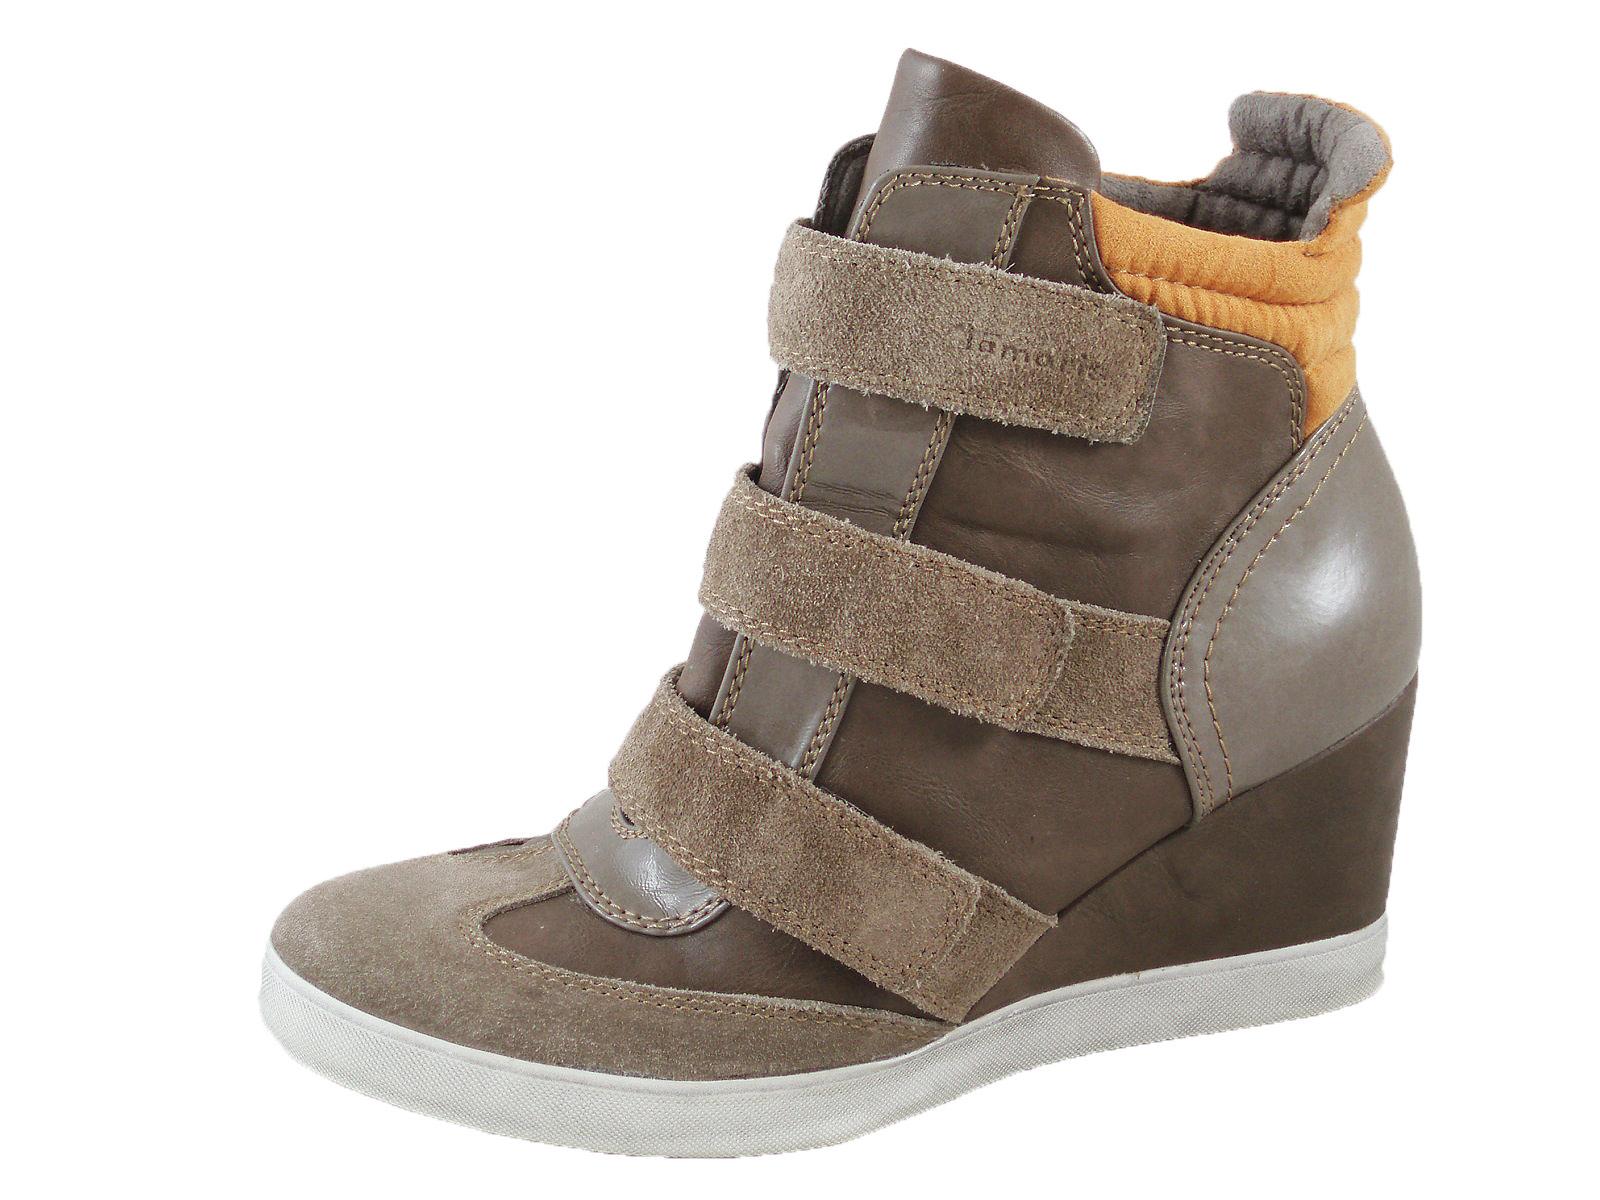 Sneakersy TAMARIS skóra r 40 - 25,5 cm a7321